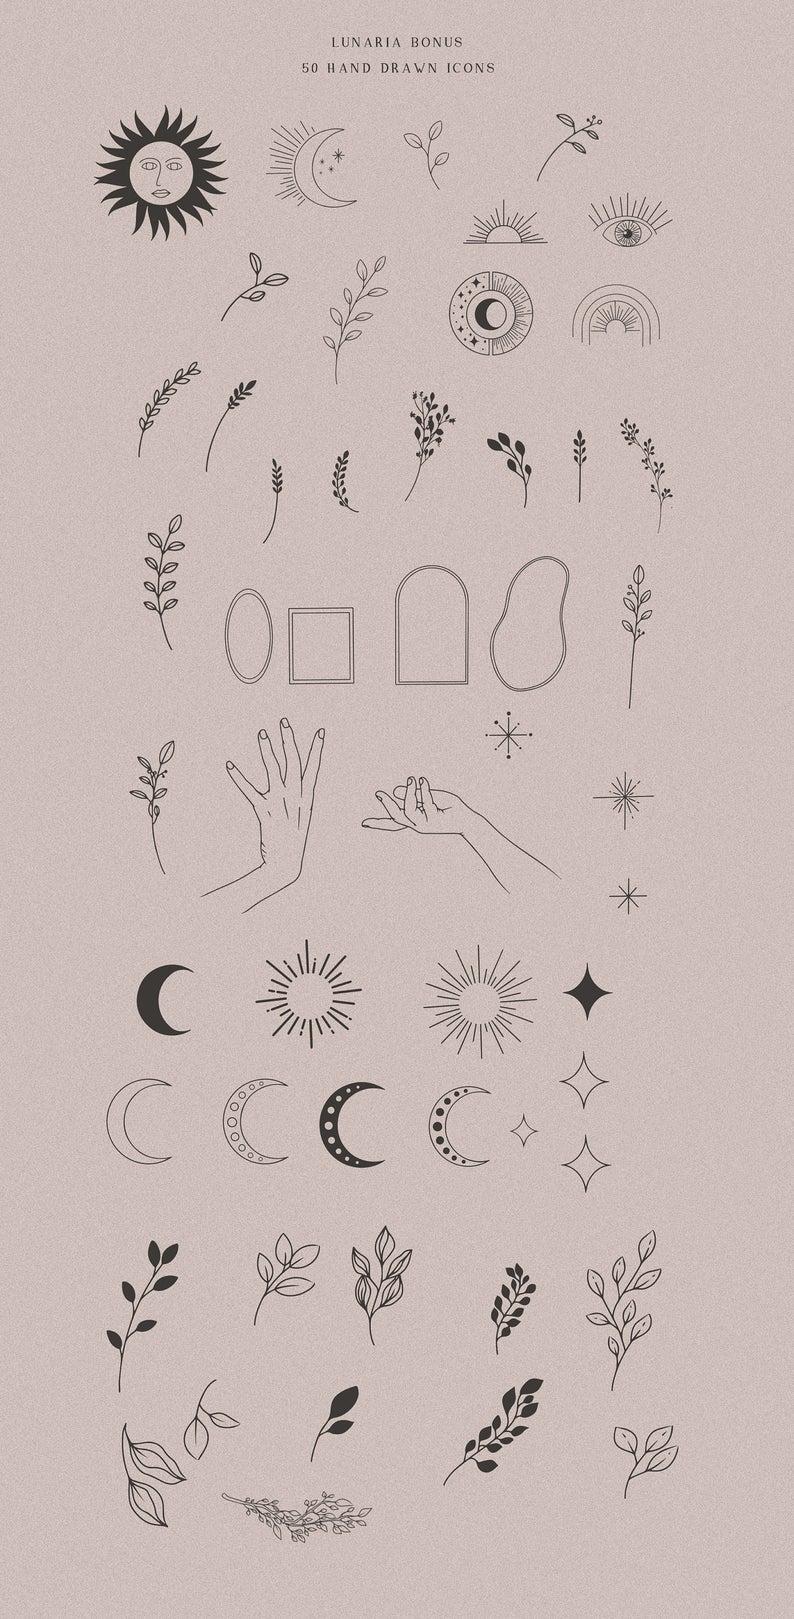 Fine art alchemy symbol zodiac esoteric moon clipart hand | Etsy